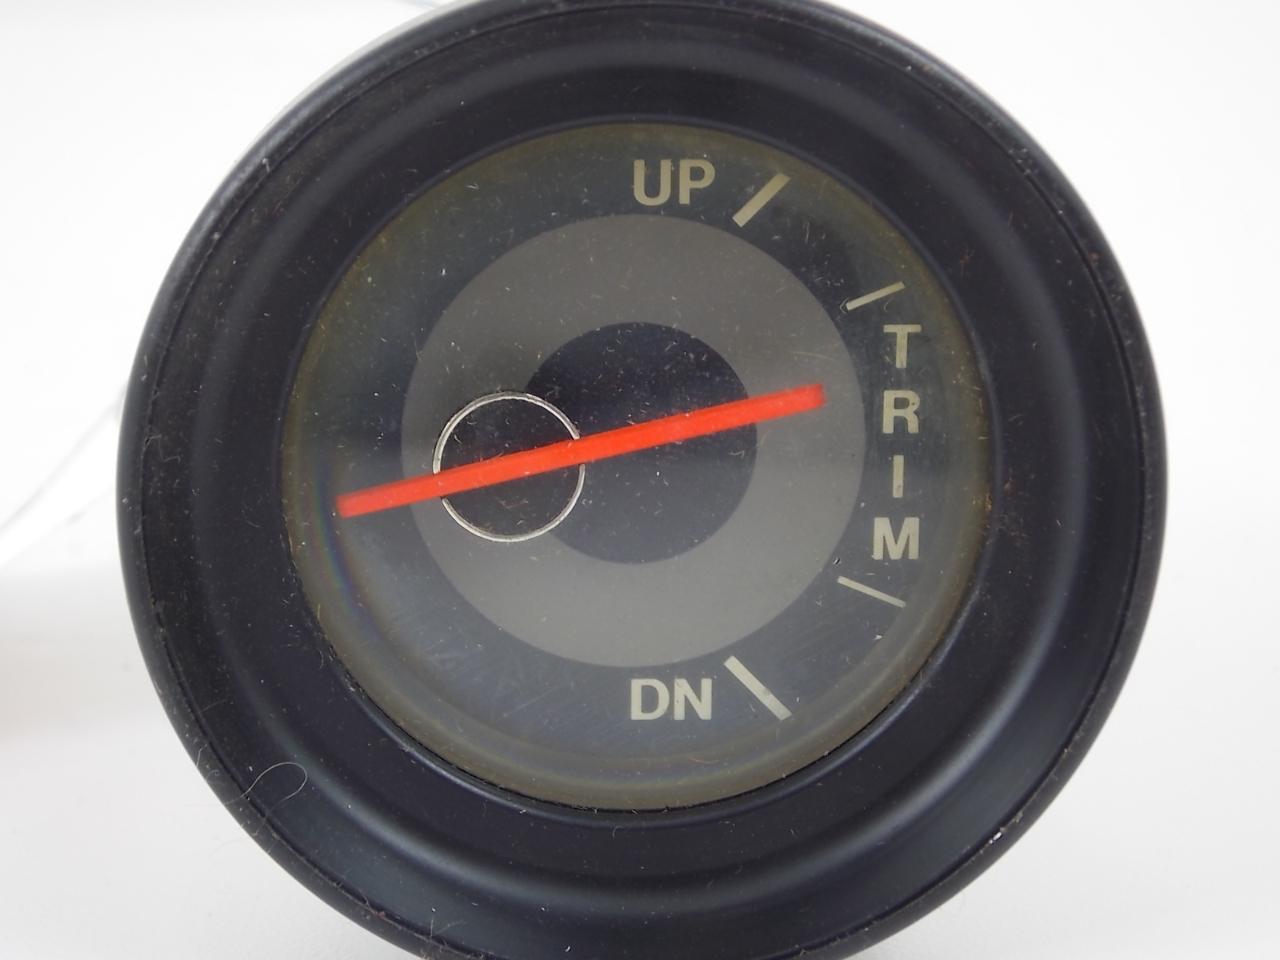 Beede Tachometer Wiring Schematic Diagrams Faria 177107 Diagram Evinrude Electrical Diesel Sender